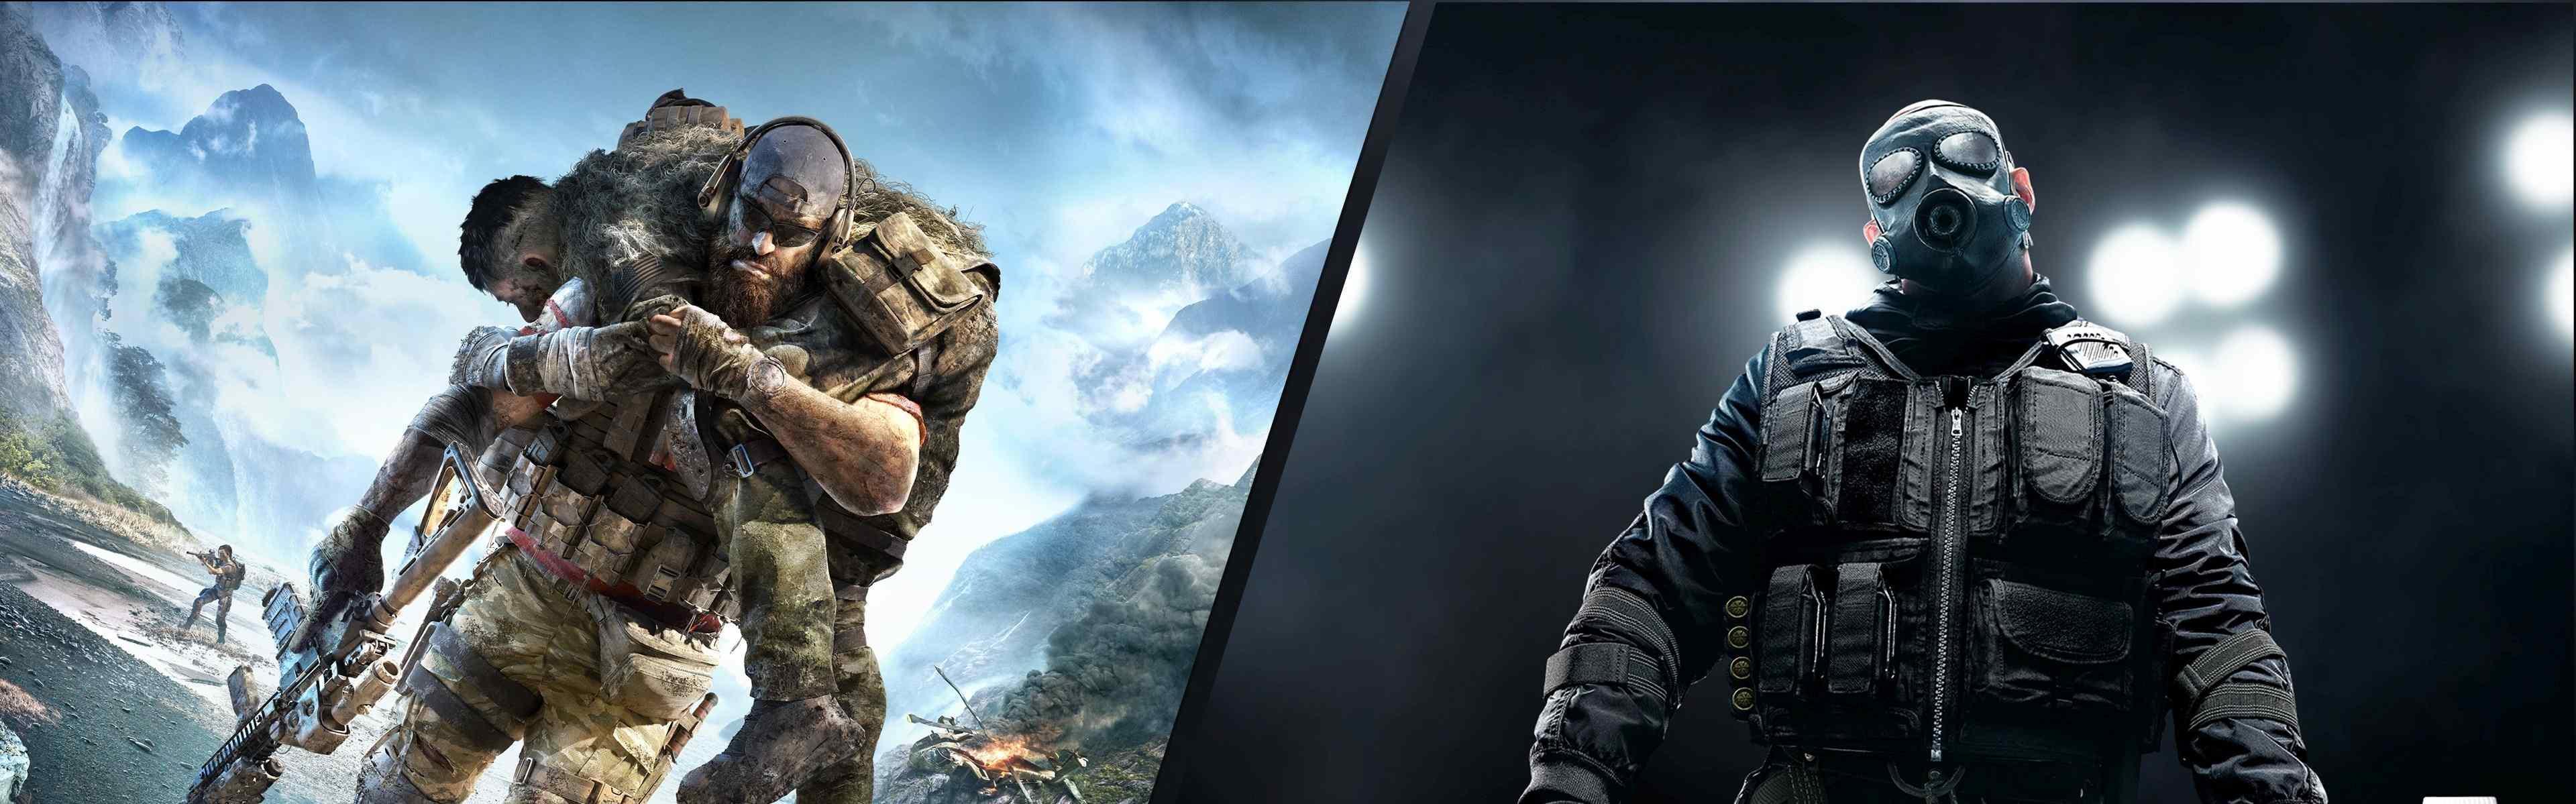 Tom Clancy's Rainbow Six: Siege and Tom Clancy's Ghost Recon: Breakpoint Bundle (Xbox One) Xbox Live Key UNITED STATES